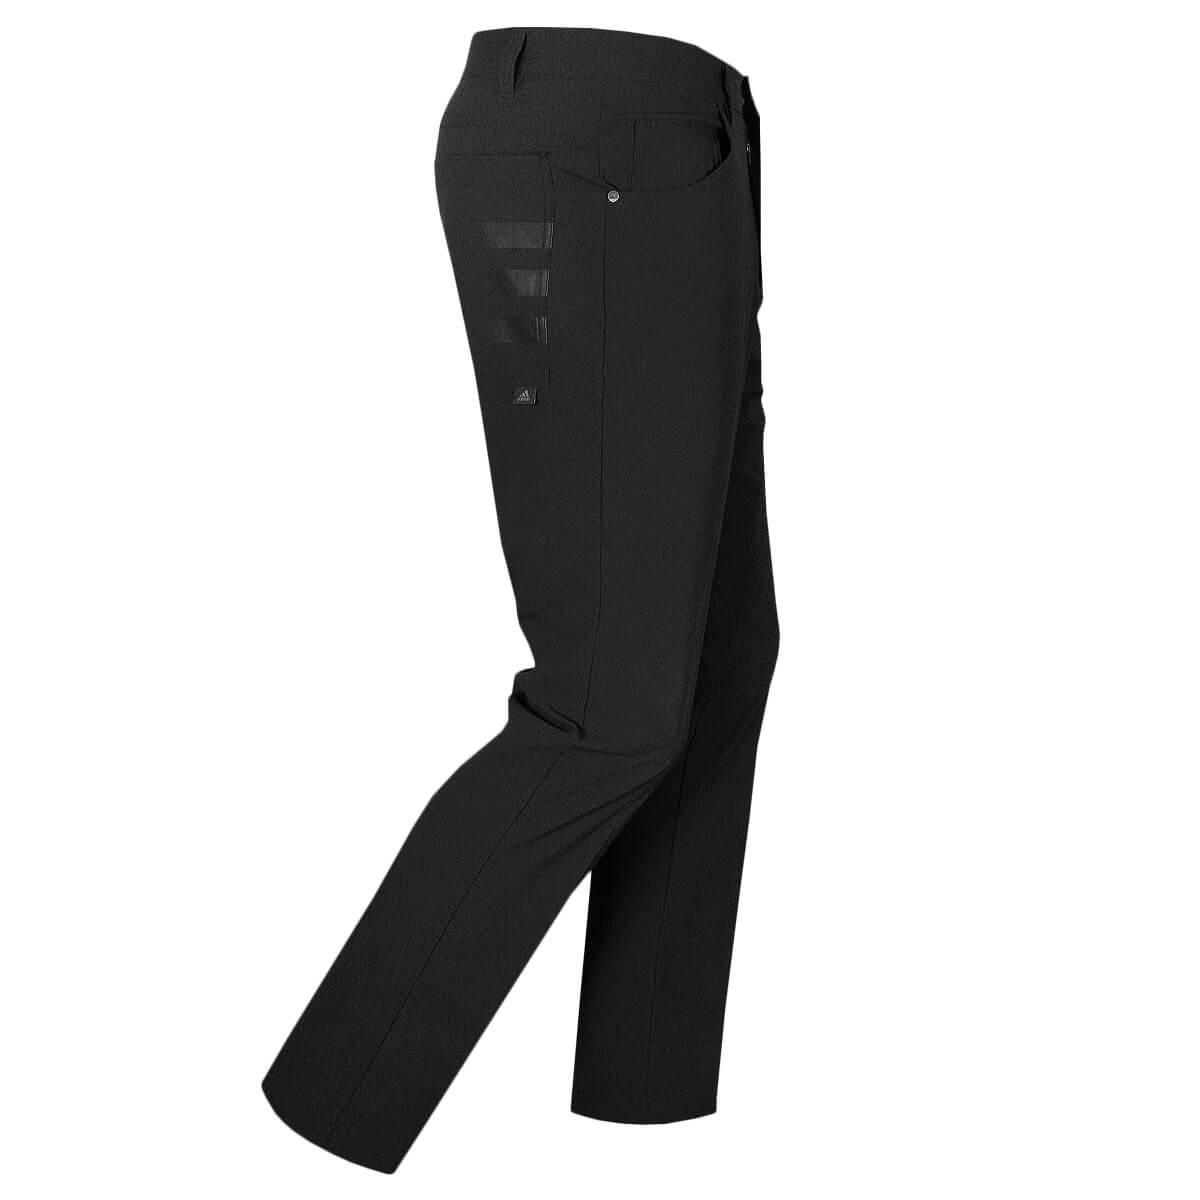 98502315c37b adidas Golf Mens Beyond 18 Slim 5 Pocket Pant